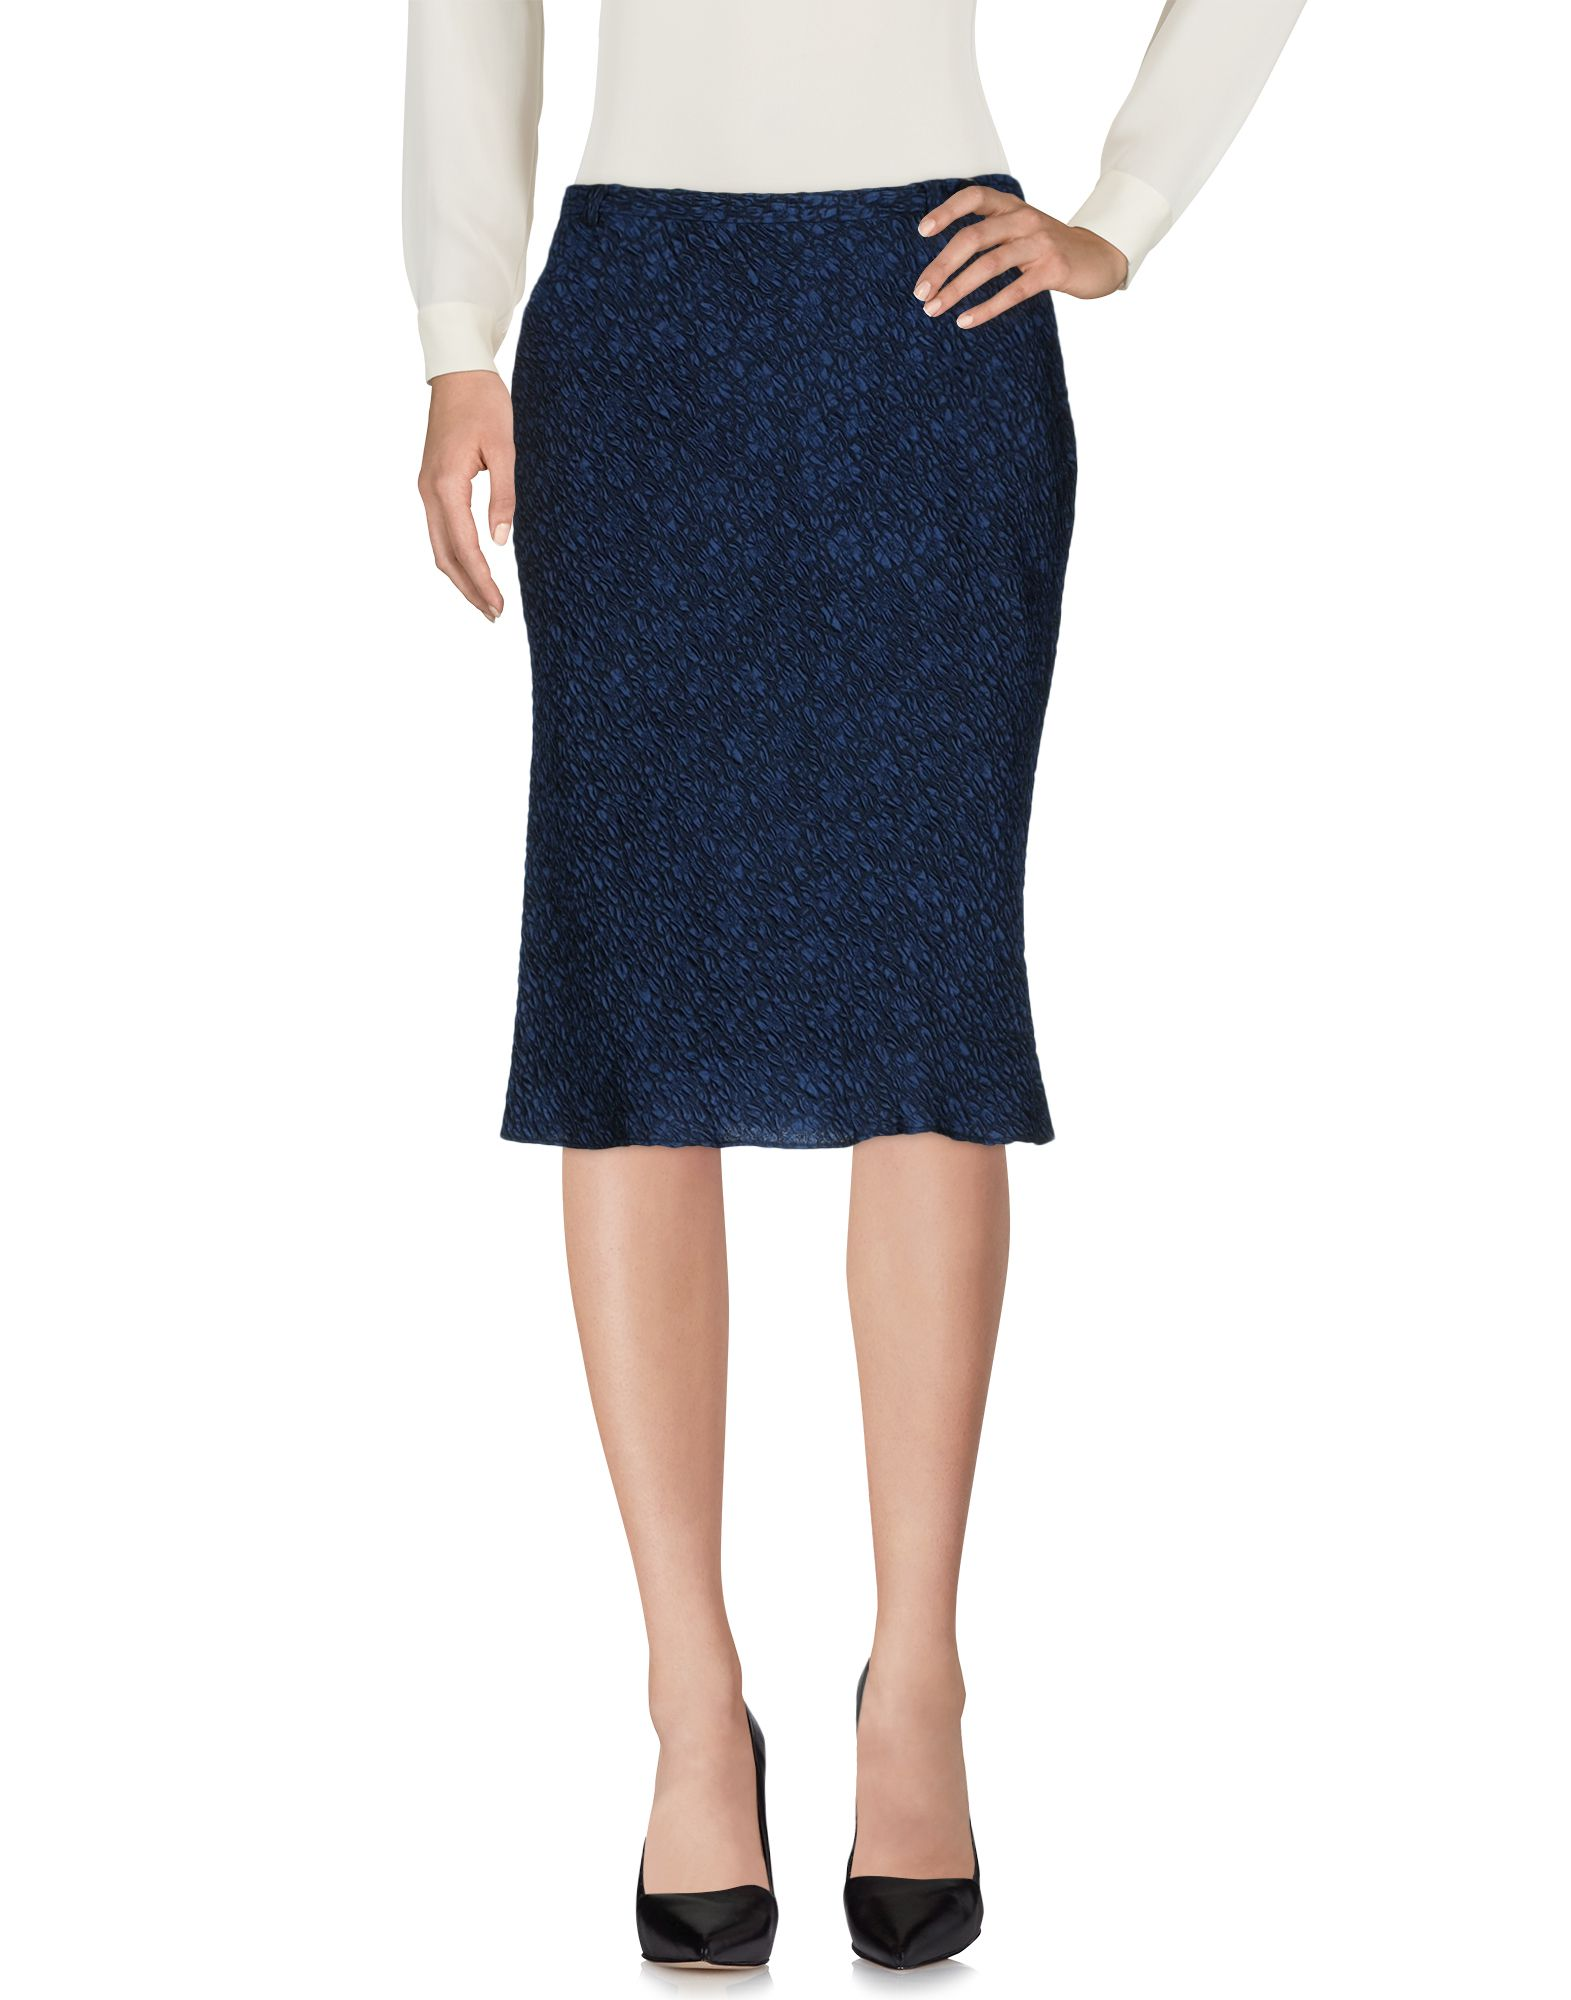 ASPESI Damen Knielanger Rock Farbe Blau Größe 5